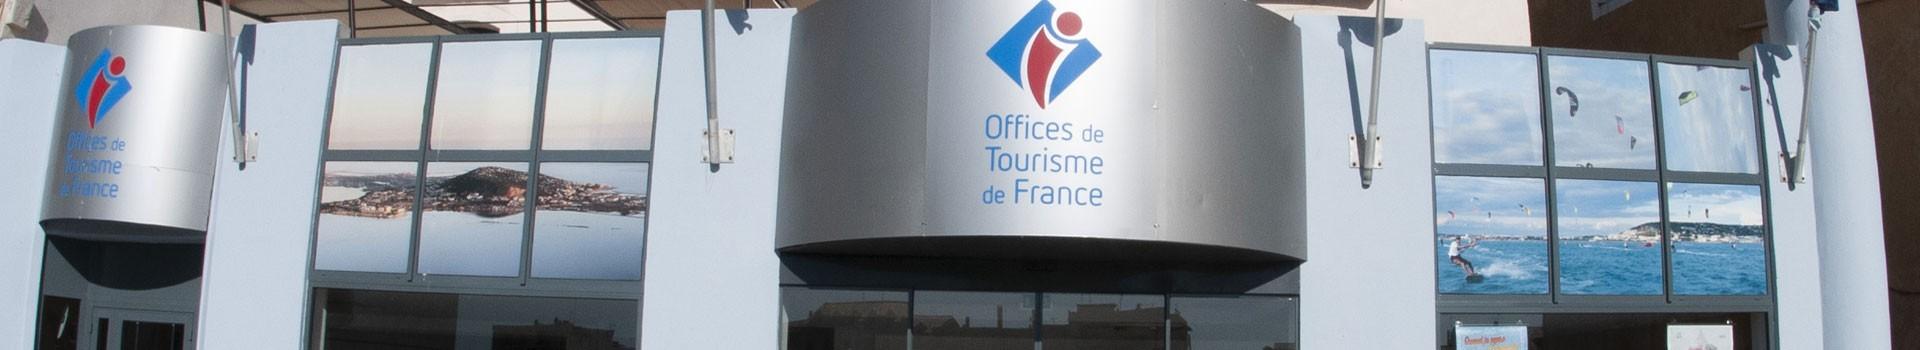 office-de-tourisme-sa-te-9988-12121-14264